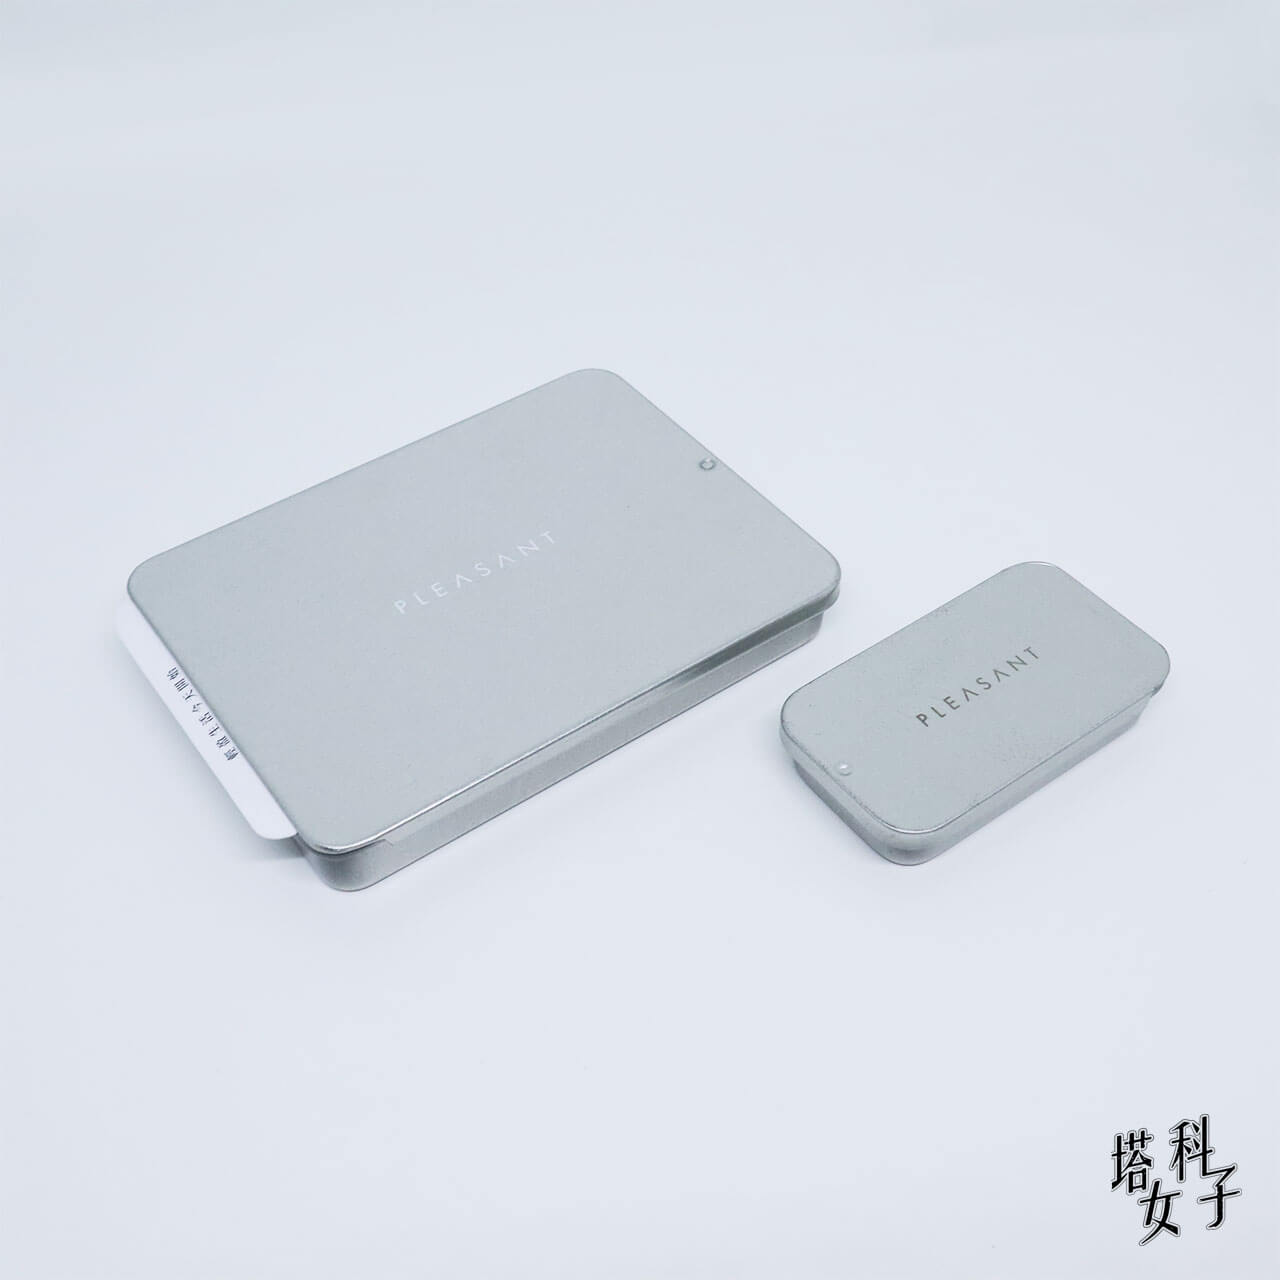 0.7 Wallet 雙面感應卡夾開箱